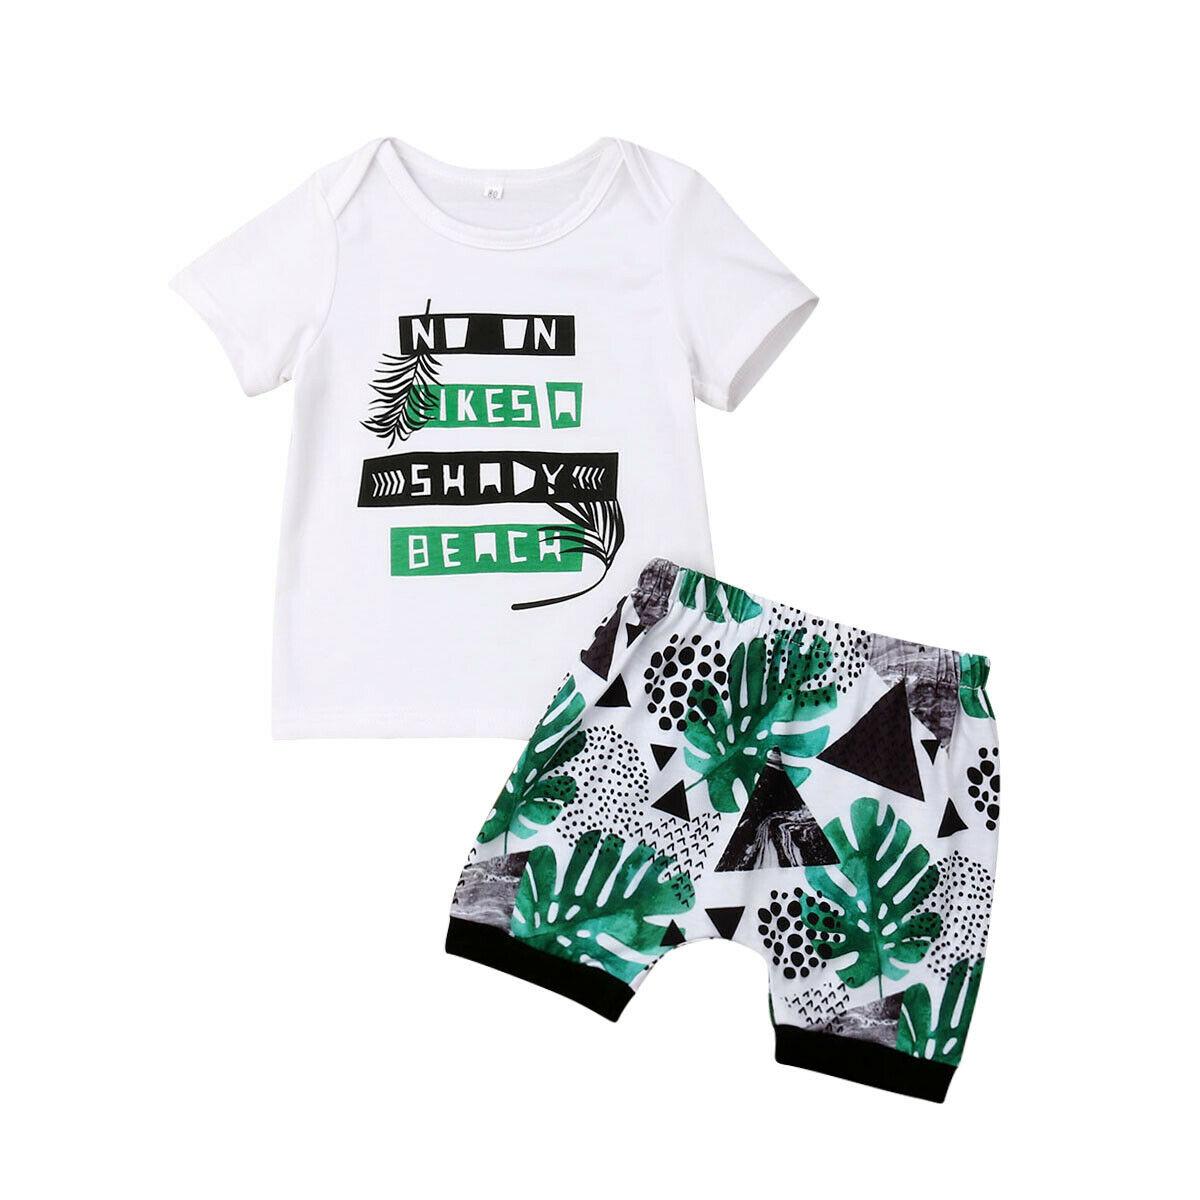 0-3y Infant Kleinkind Kinder Baby Jungen Kleidung Kurzarm Baumwolle T-shirt Tops Shorts Hose 2 Pcs Outfit Beachwear Sommer Kleidung Set Schnelle Farbe